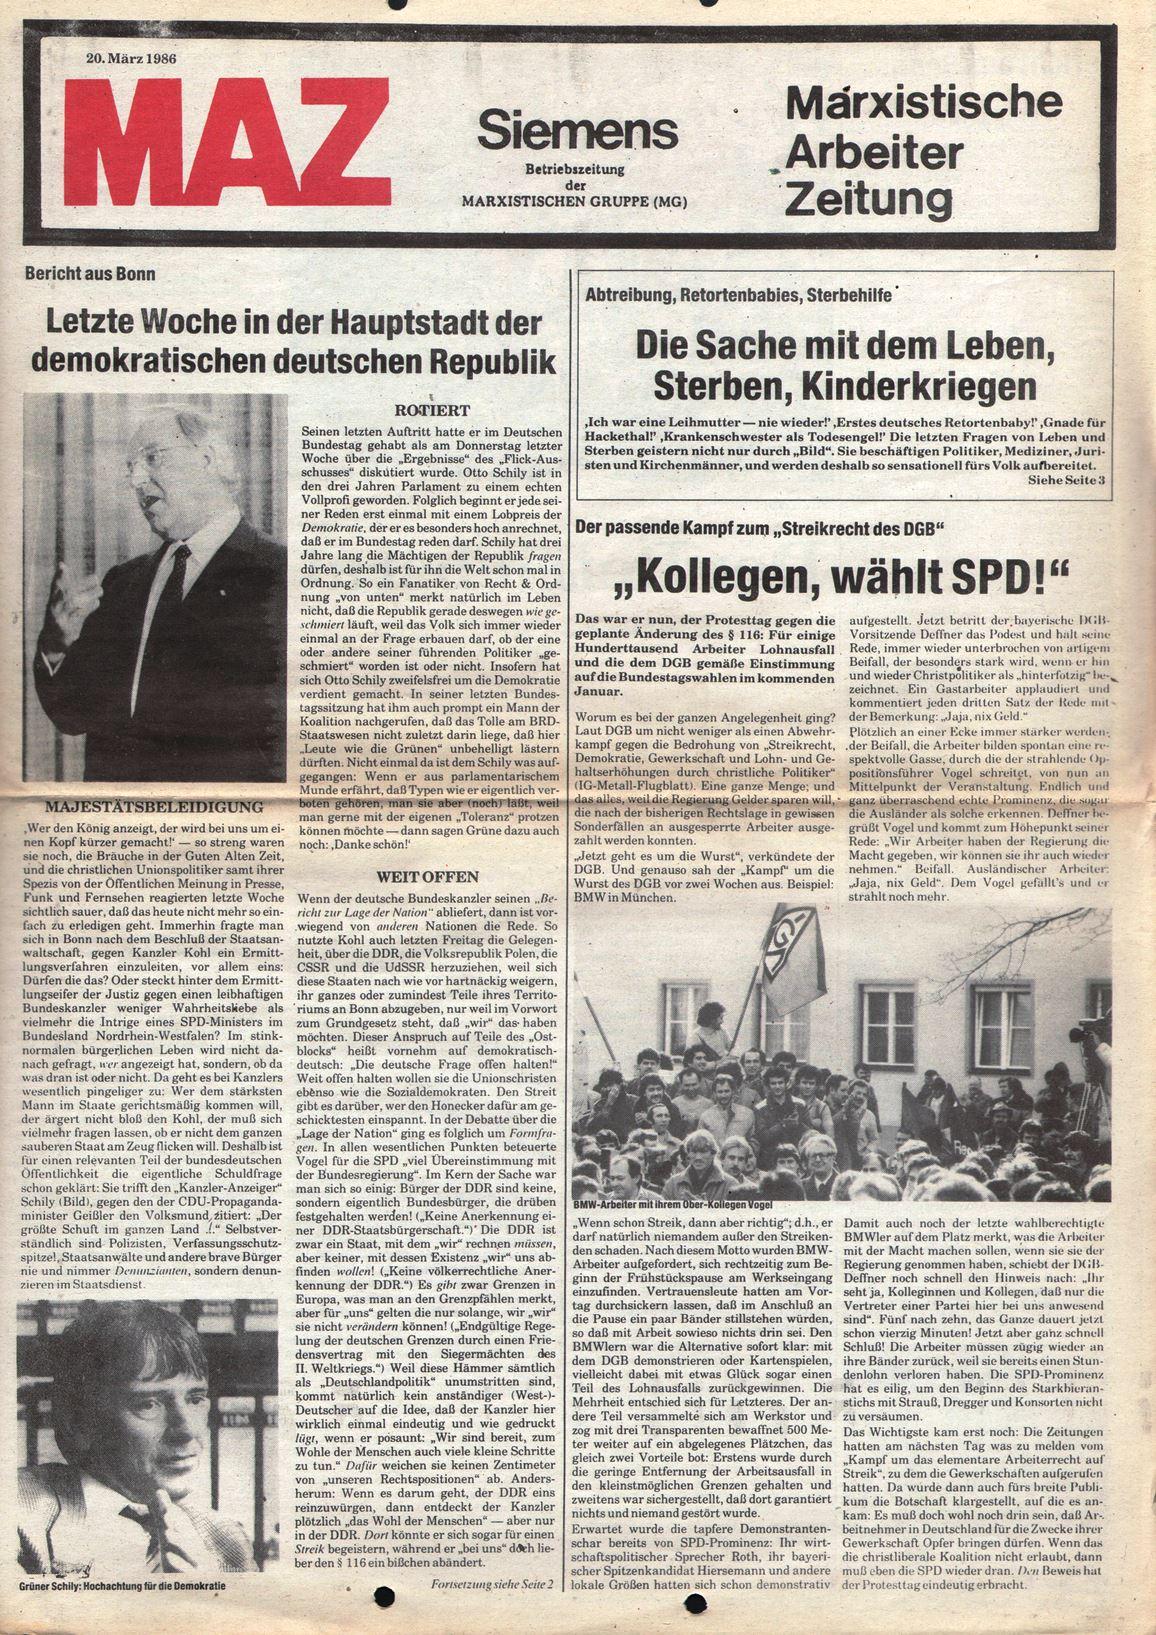 Muenchen_MG_MAZ_Siemens_19860320_01